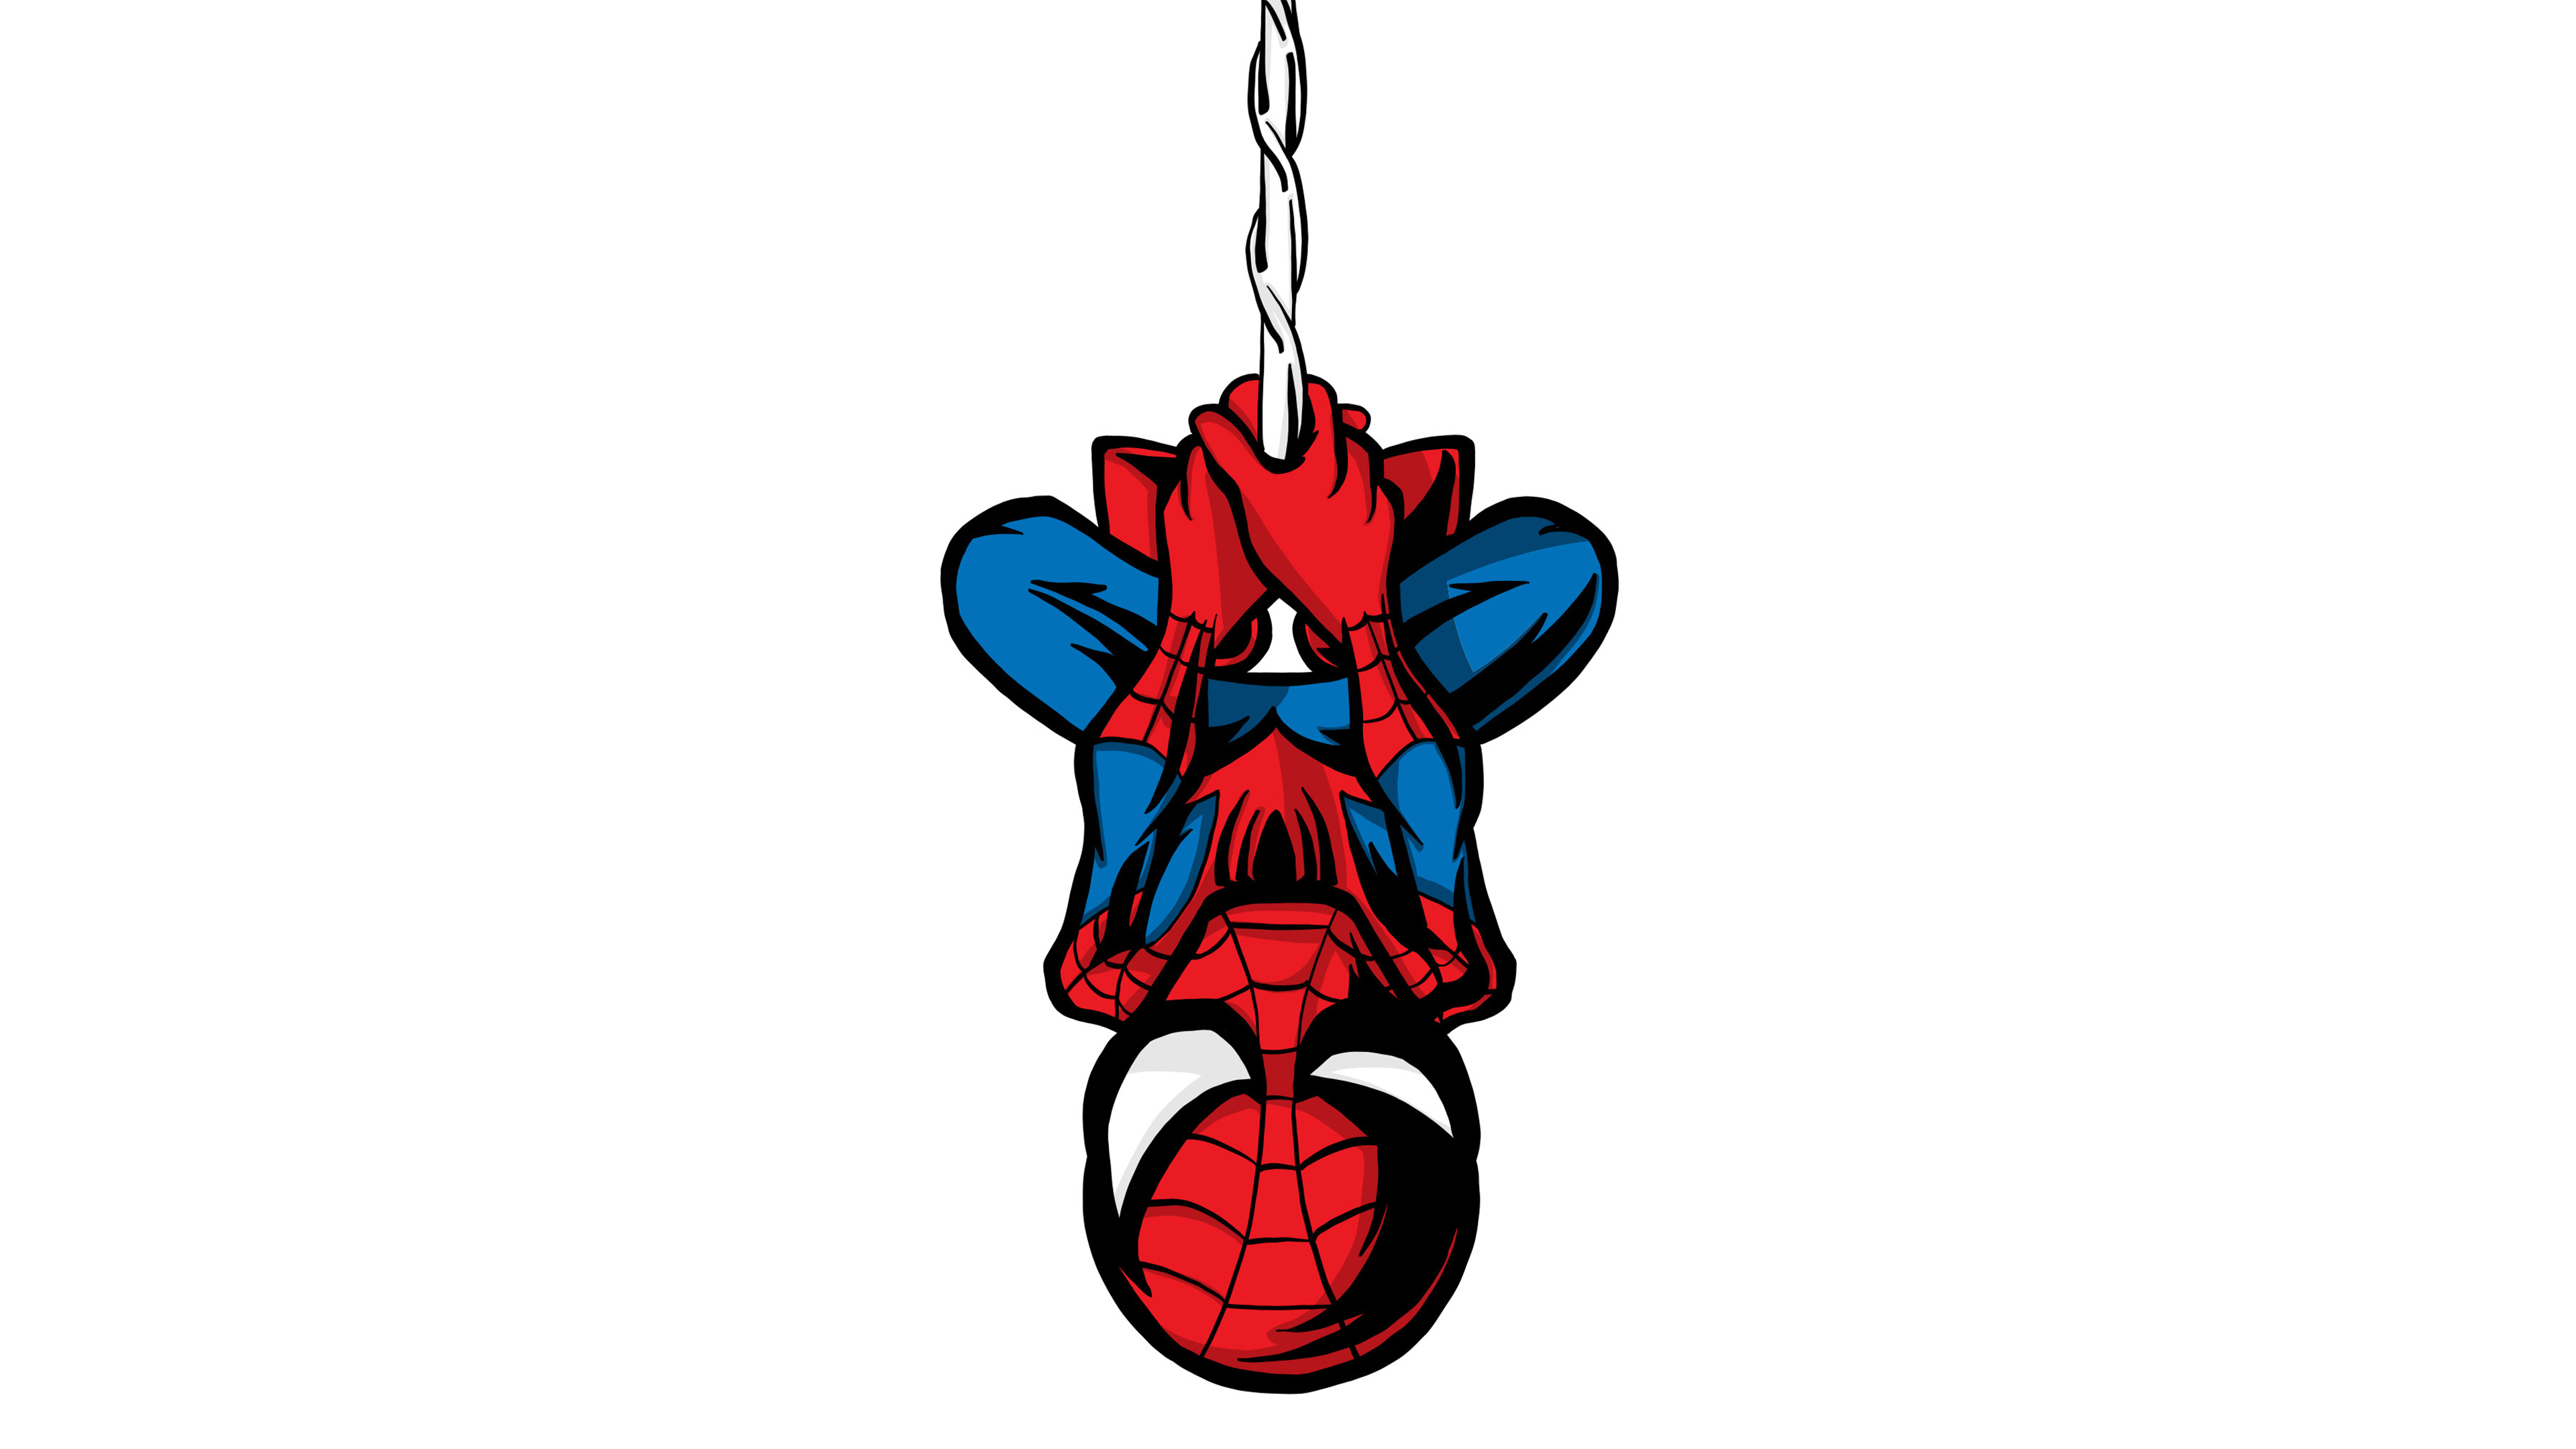 spiderman illustration minimalist 4k 1536522789 - Spiderman Illustration Minimalist 4k - superheroes wallpapers, spiderman wallpapers, illustration wallpapers, hd-wallpapers, digital art wallpapers, behance wallpapers, 4k-wallpapers